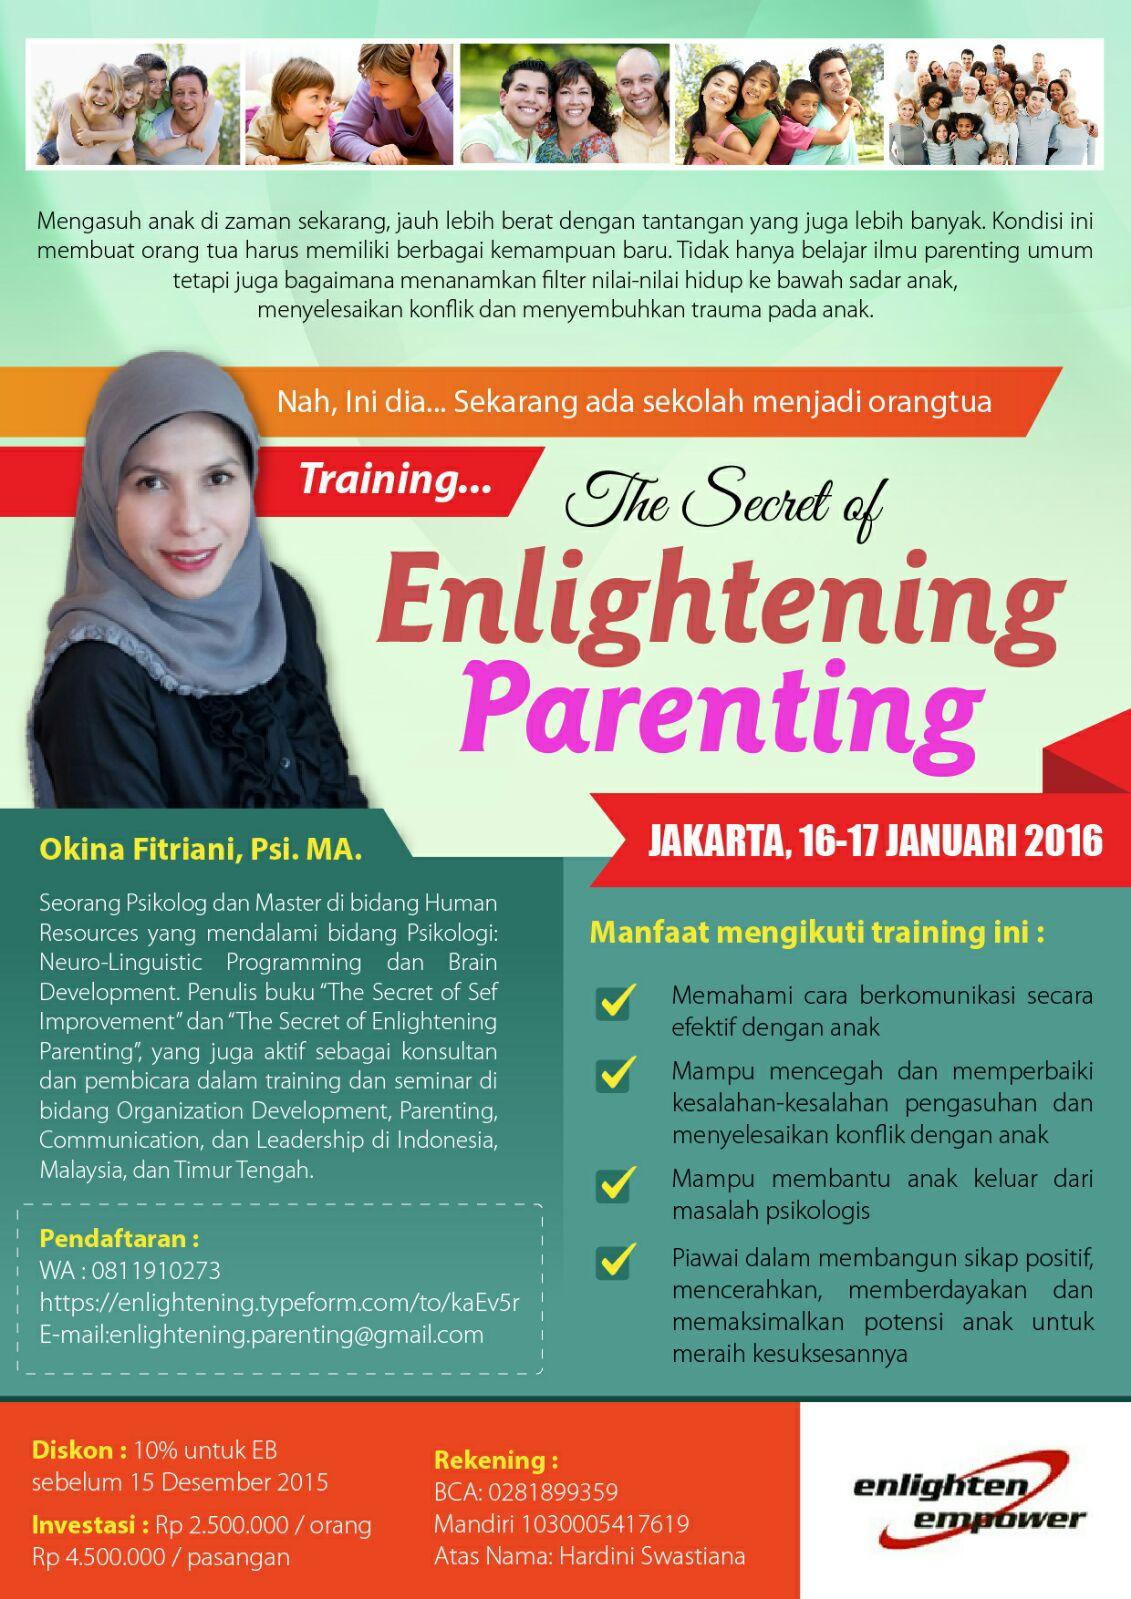 Parentingjpg